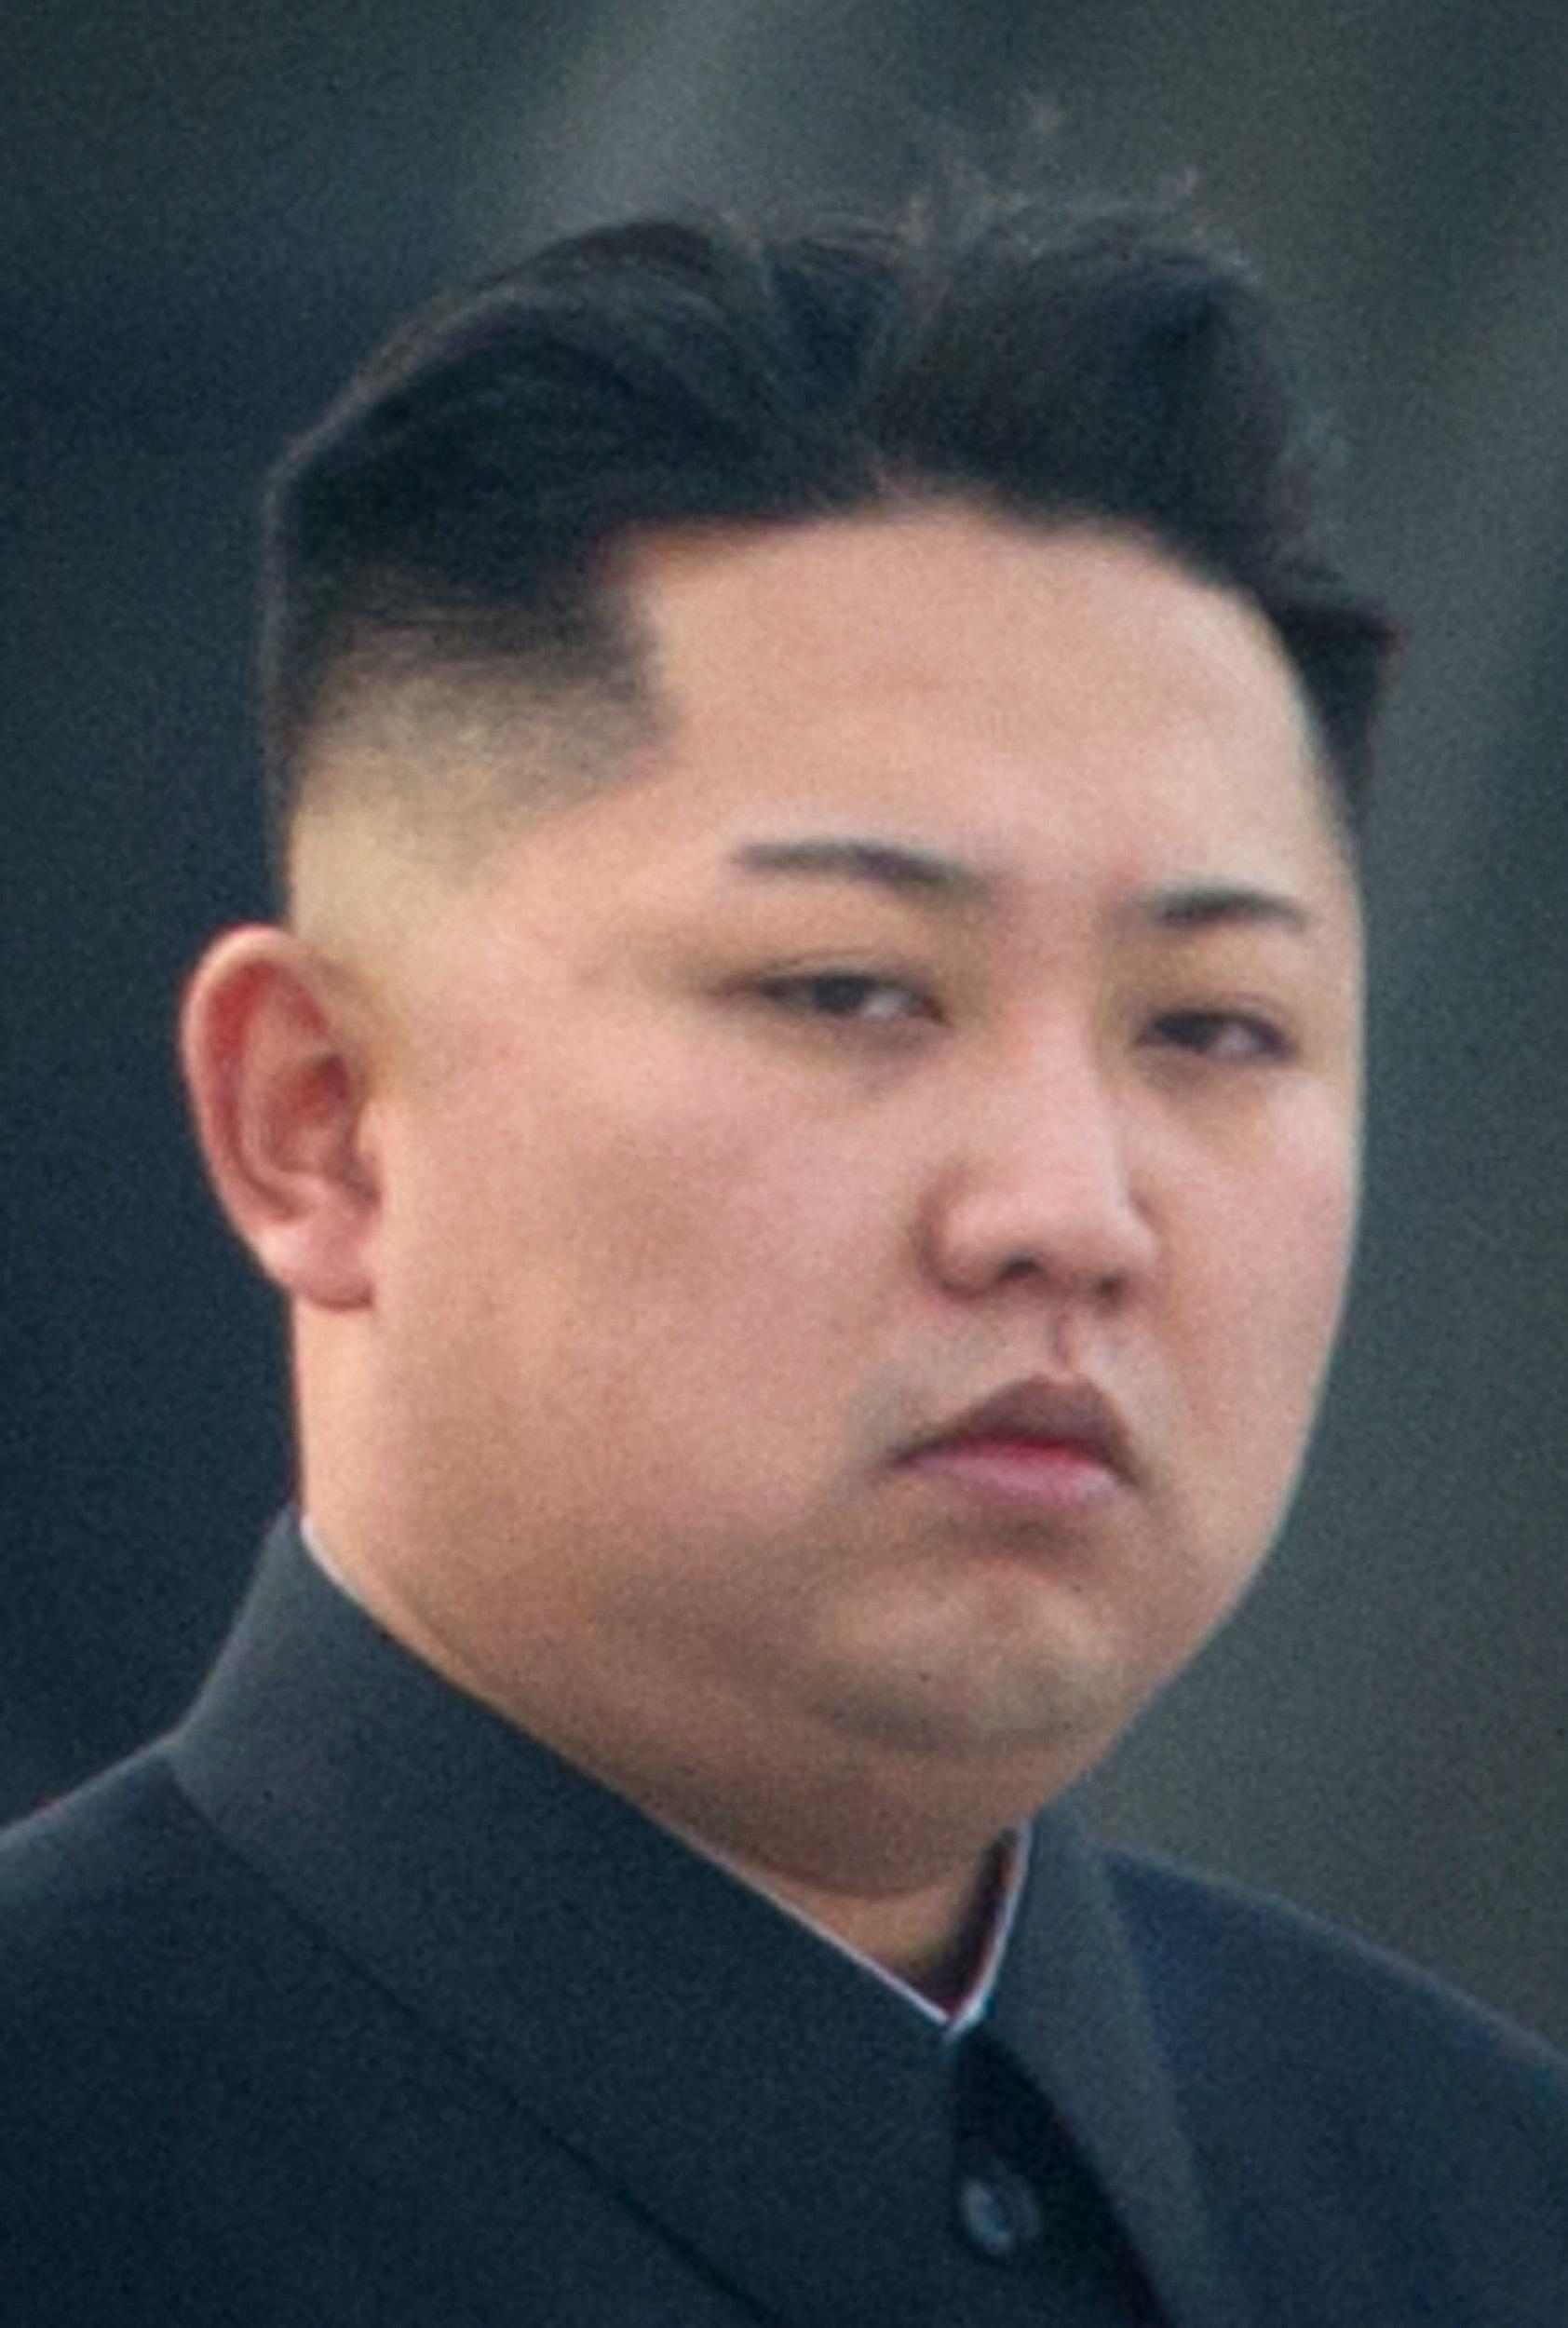 Kim Jong Uns New Haircut Shaven Eyebrows Are A Little Weird A